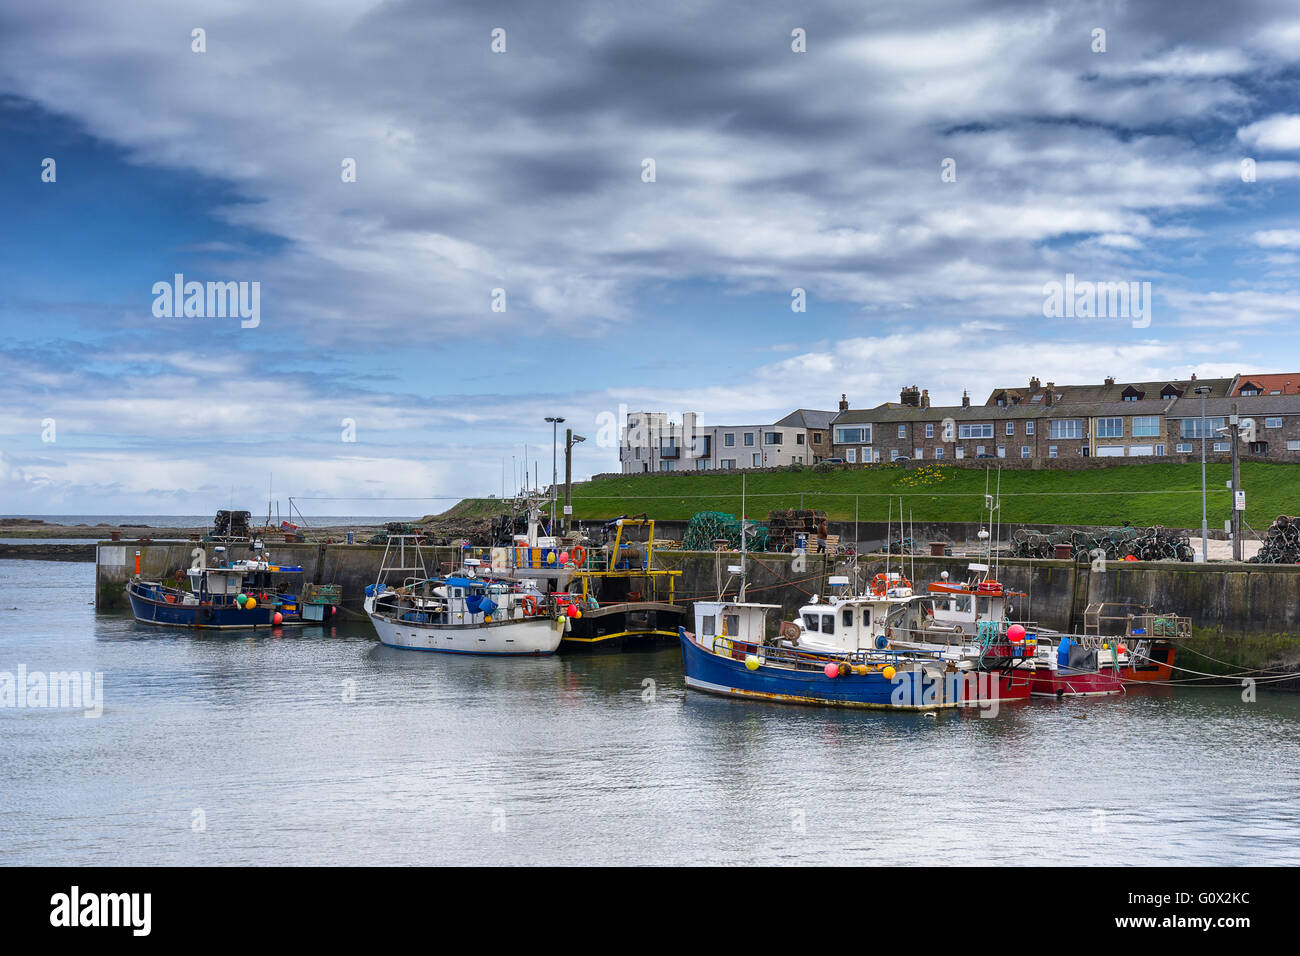 Seahouses harbor on the coast of Northumbria - Stock Image